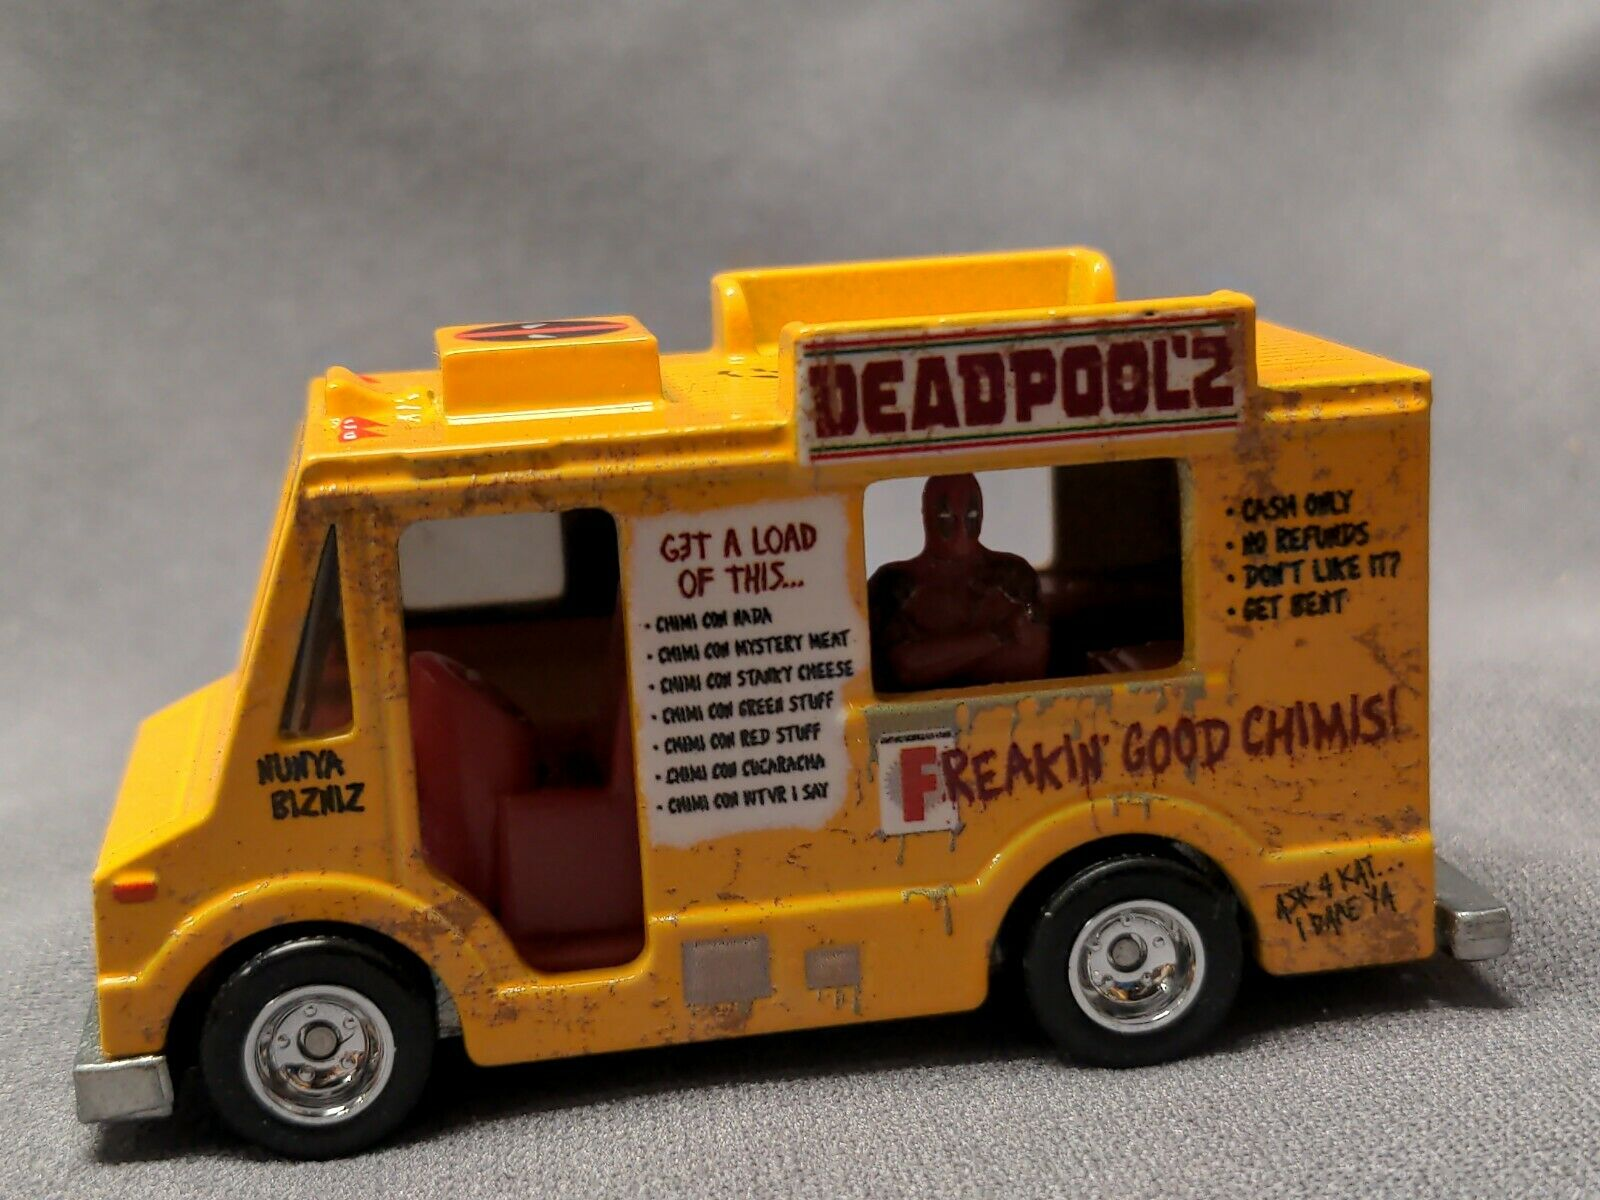 2020 Hot Wheels Retro Deadpool Chimichanga Truck 1 64 Diecast Car Grp96 Cars Trucks Vans Toys Hobbies